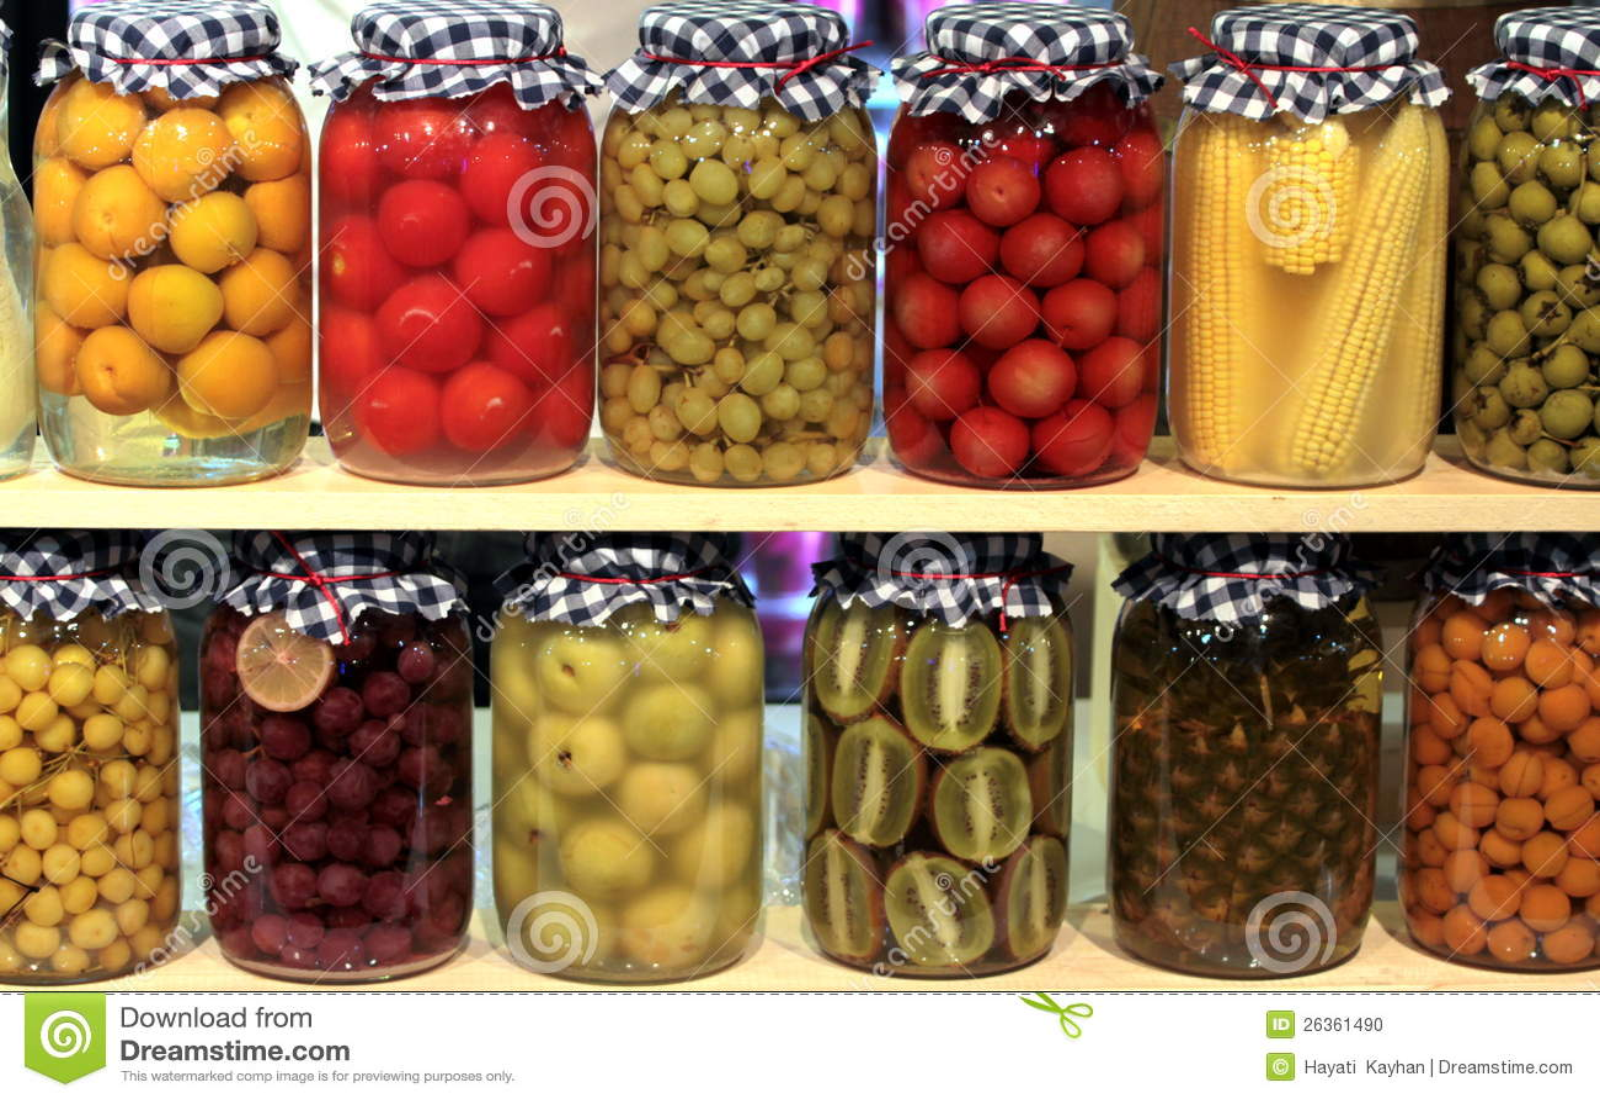 fruits et l gumes conserve de fruits photo stock image. Black Bedroom Furniture Sets. Home Design Ideas